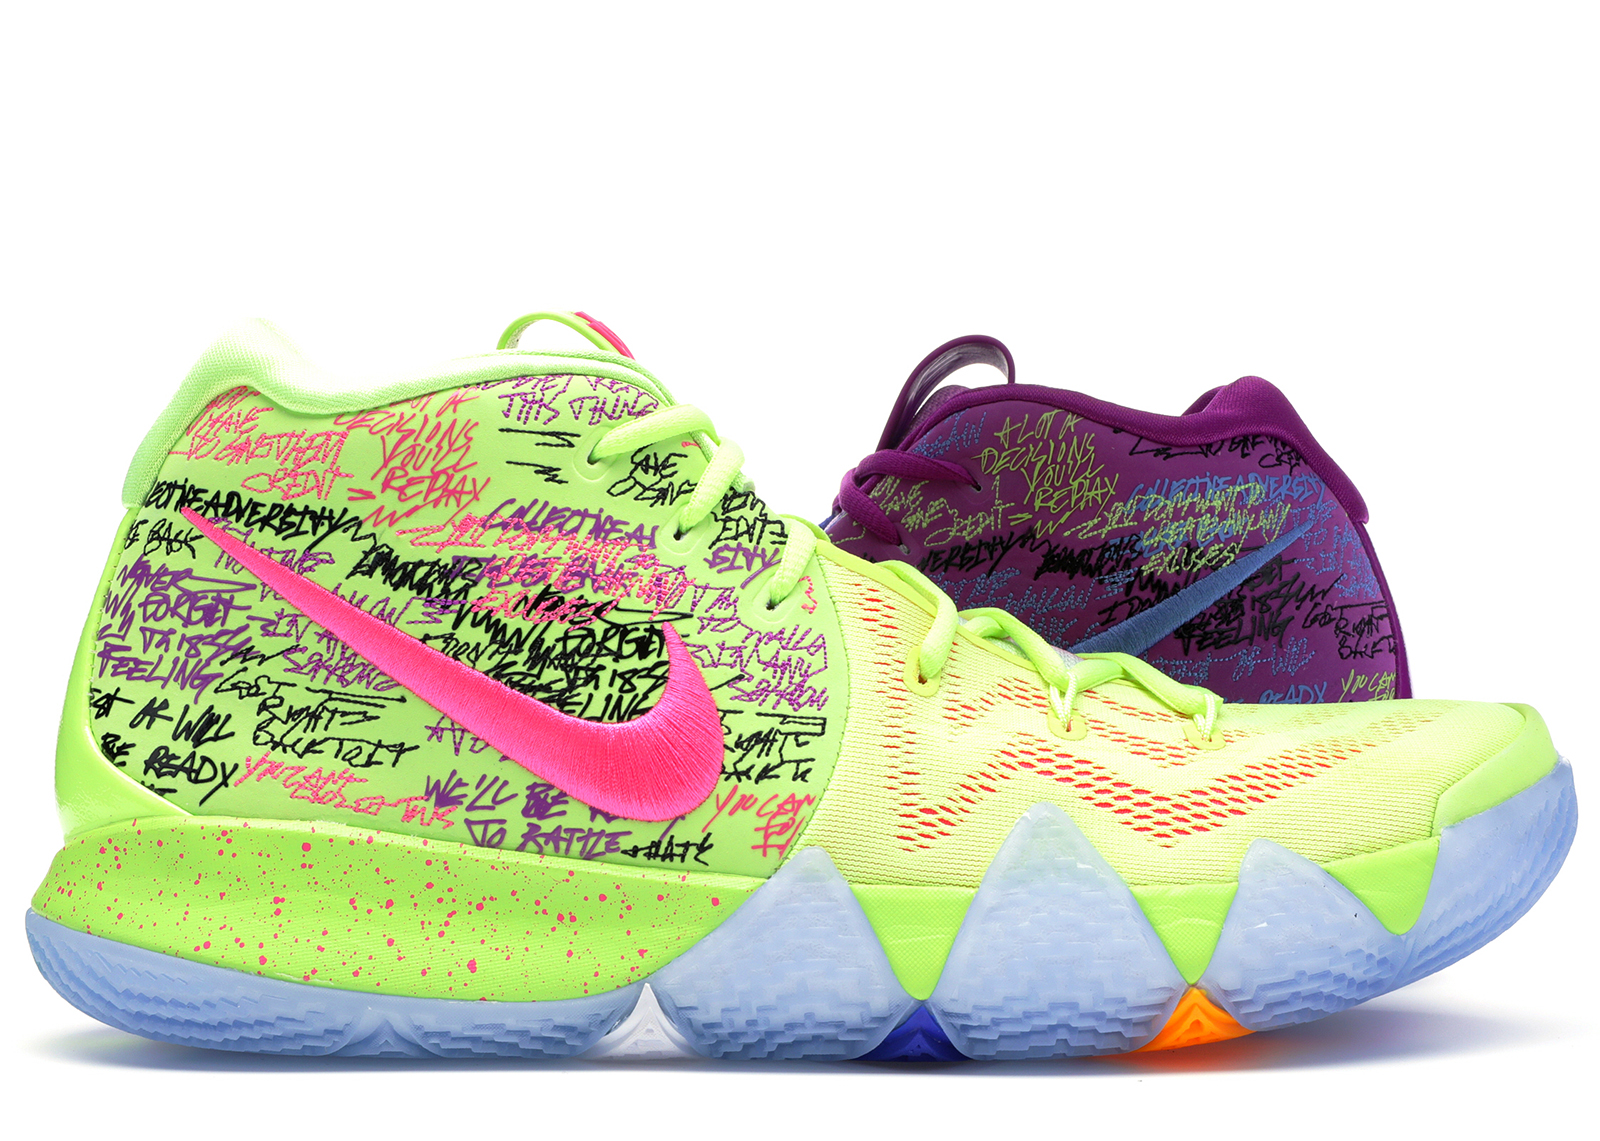 Nike Kyrie 4 Confetti - 943806-900